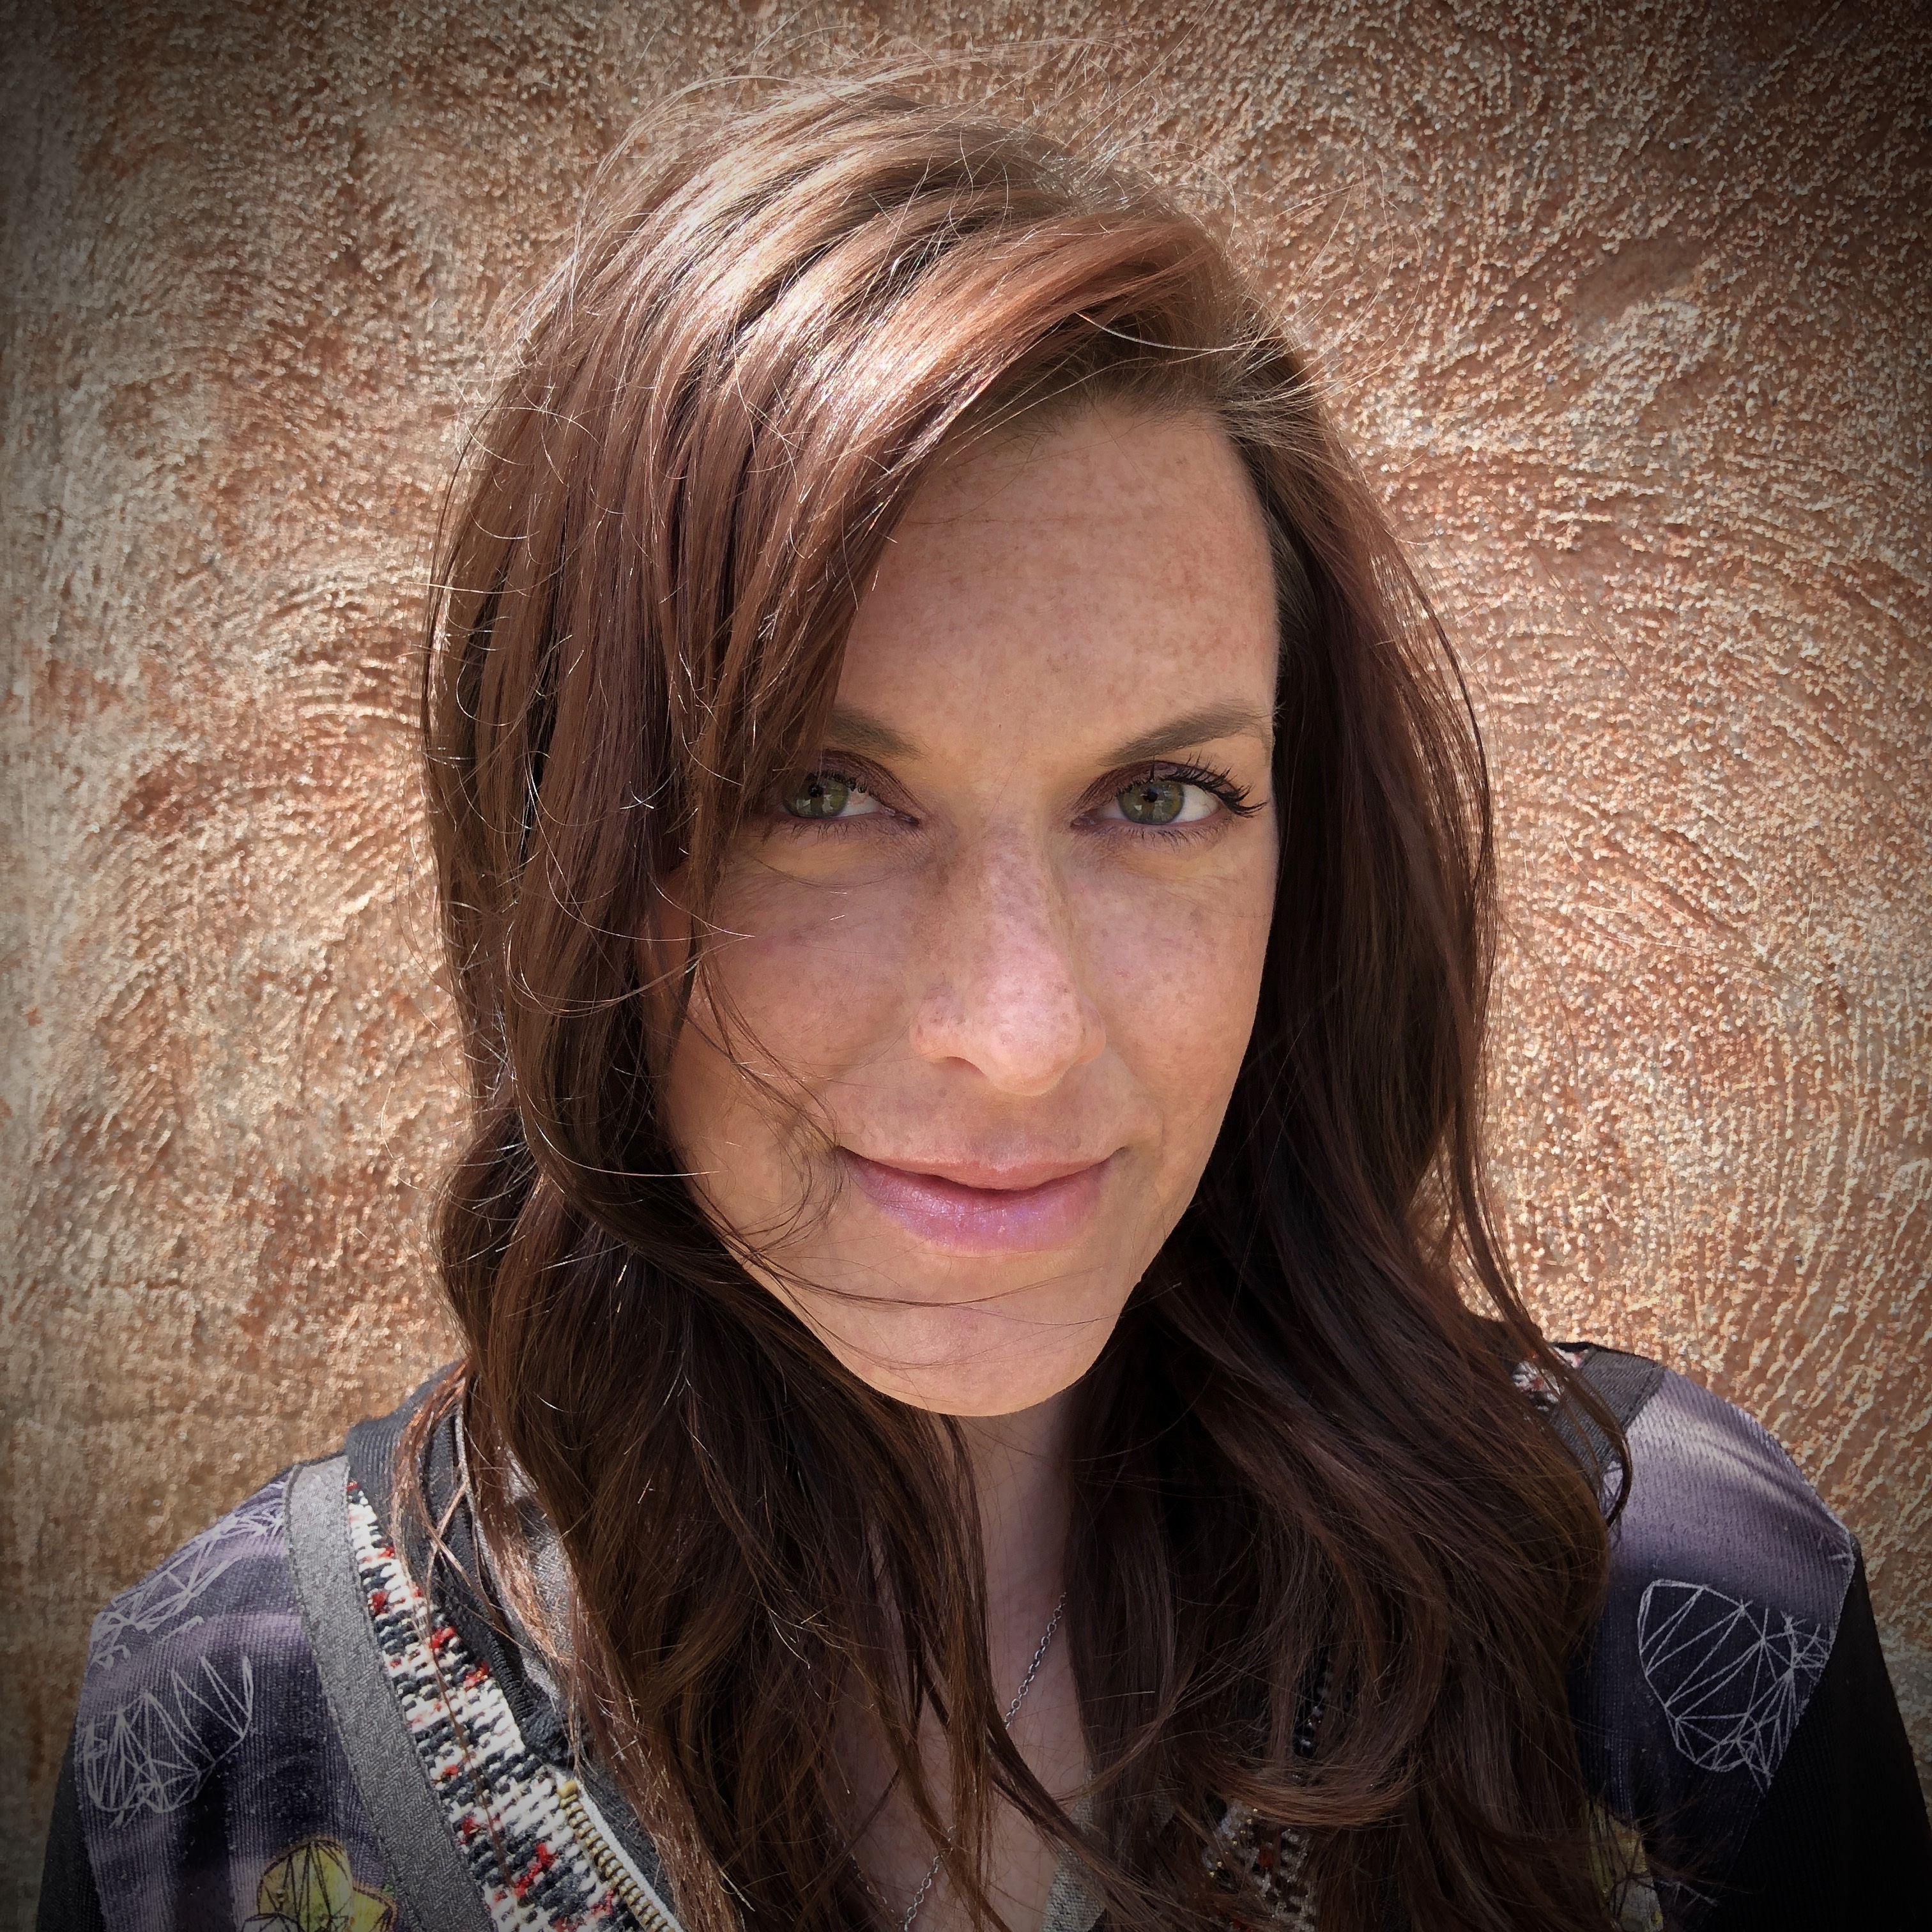 Heather undefined Bullock